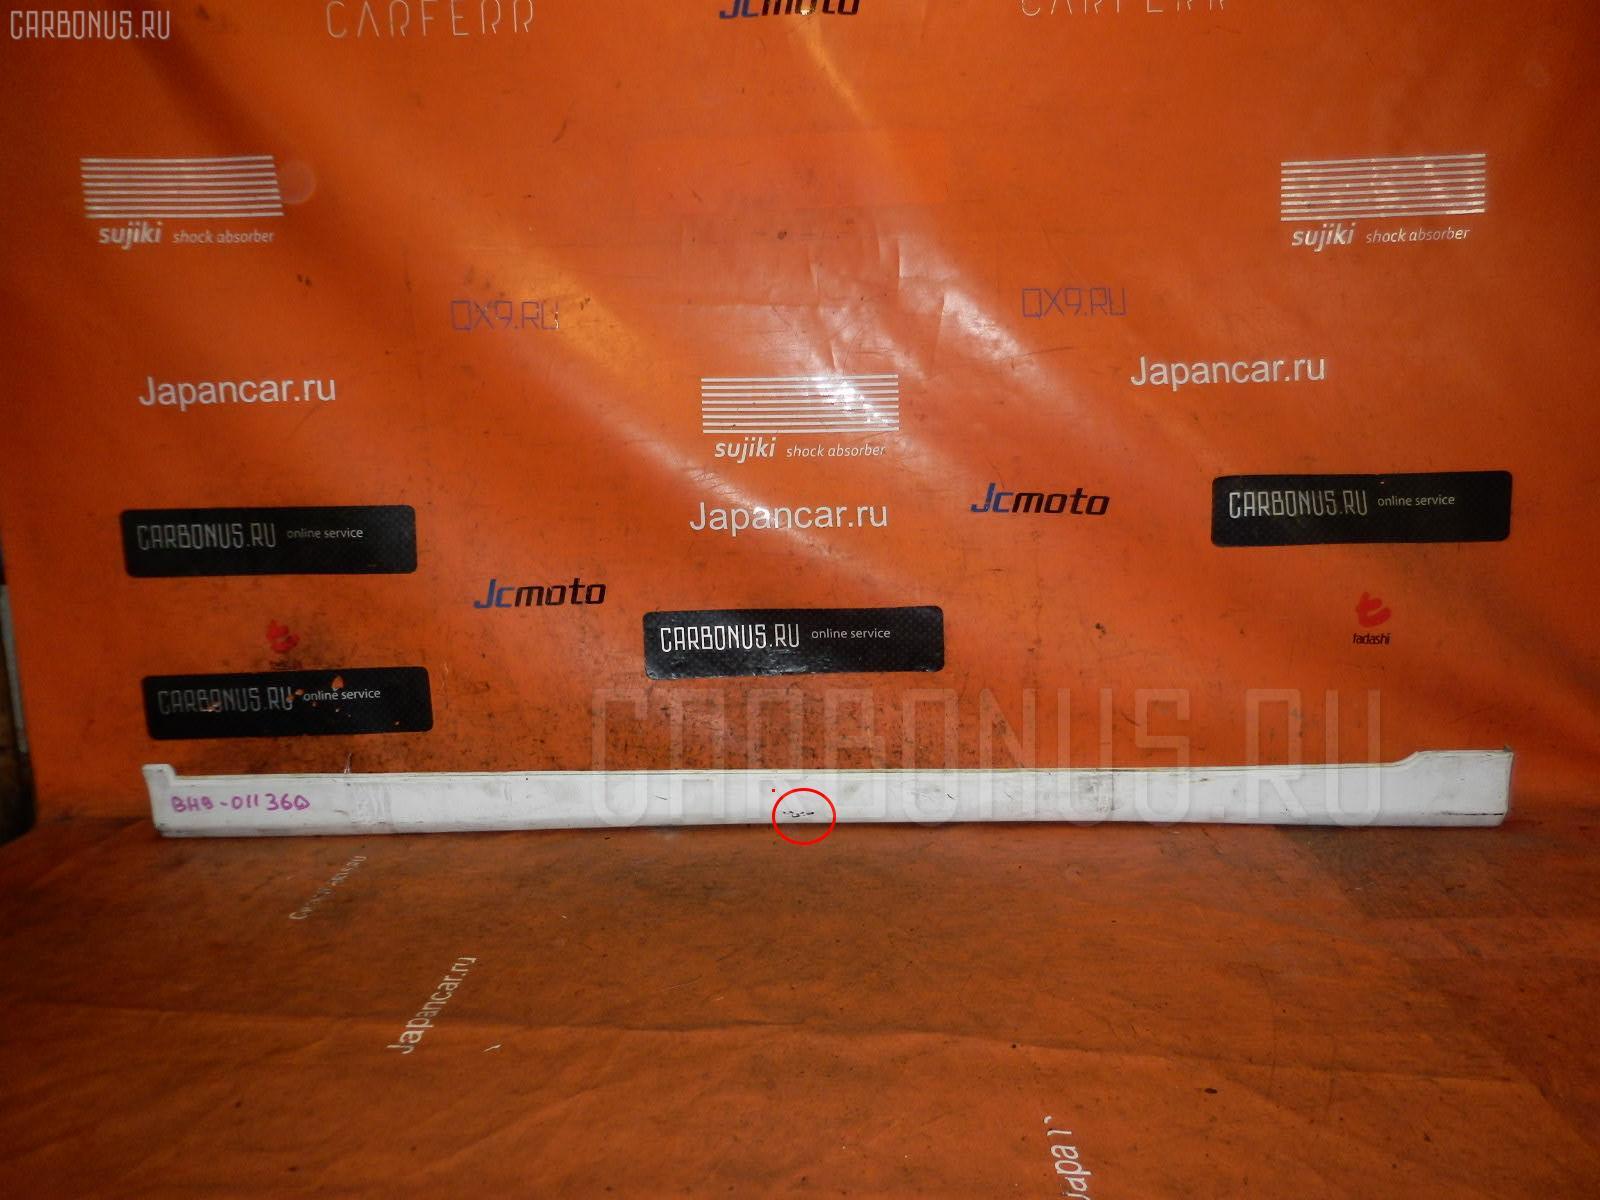 Порог кузова пластиковый ( обвес ) SUBARU LEGACY WAGON BH9 Фото 4